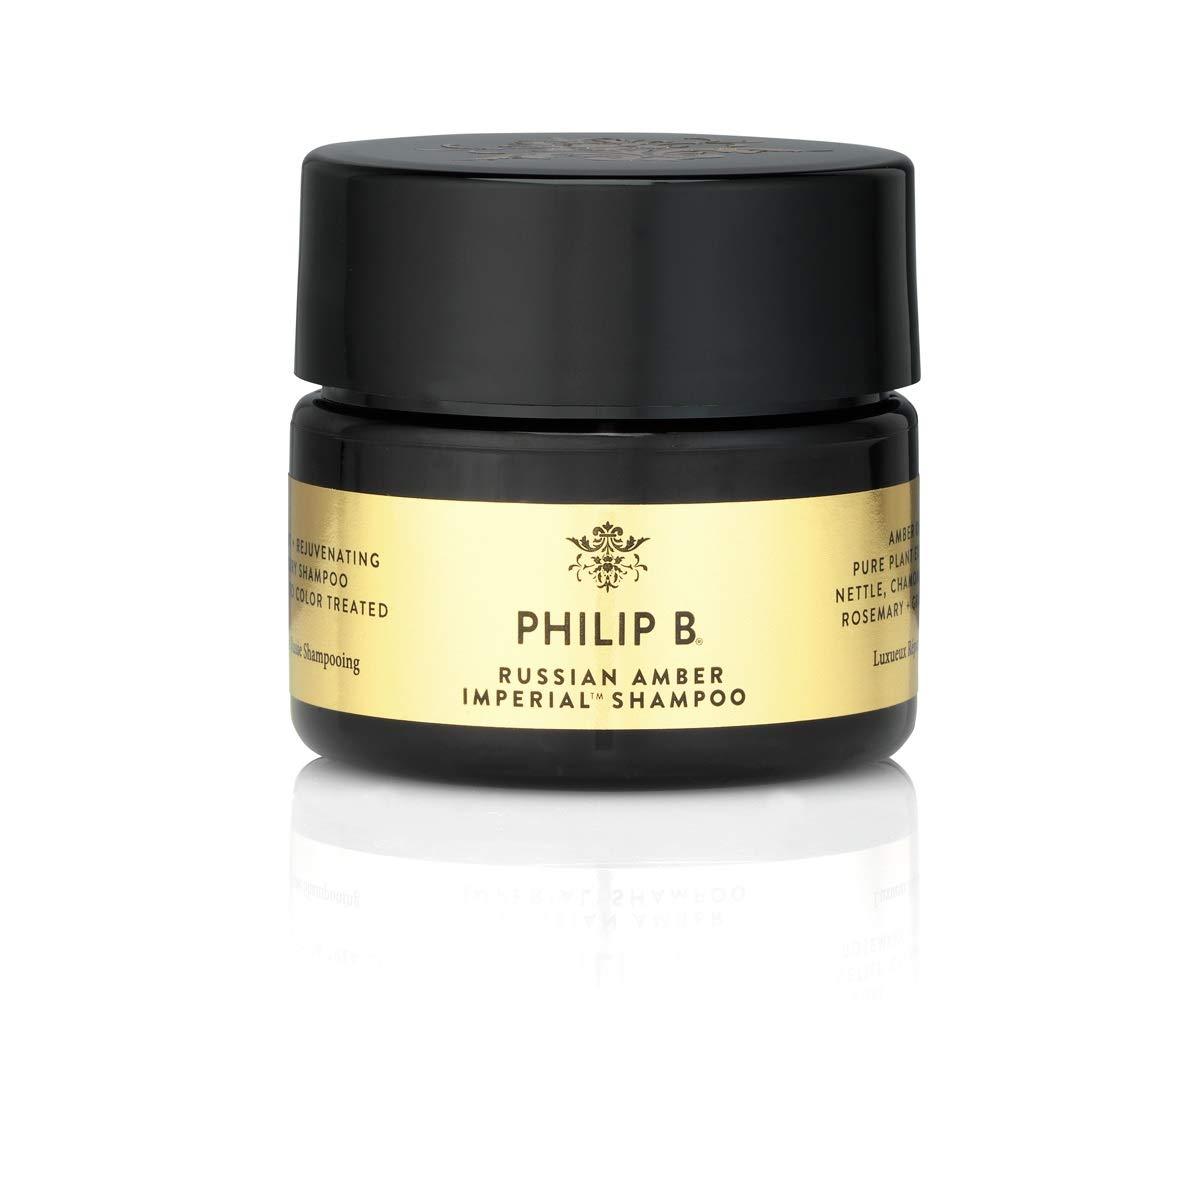 PHILIP B Russian Amber Imperial Shampoo, 3 Fl Oz by PHILIP B.